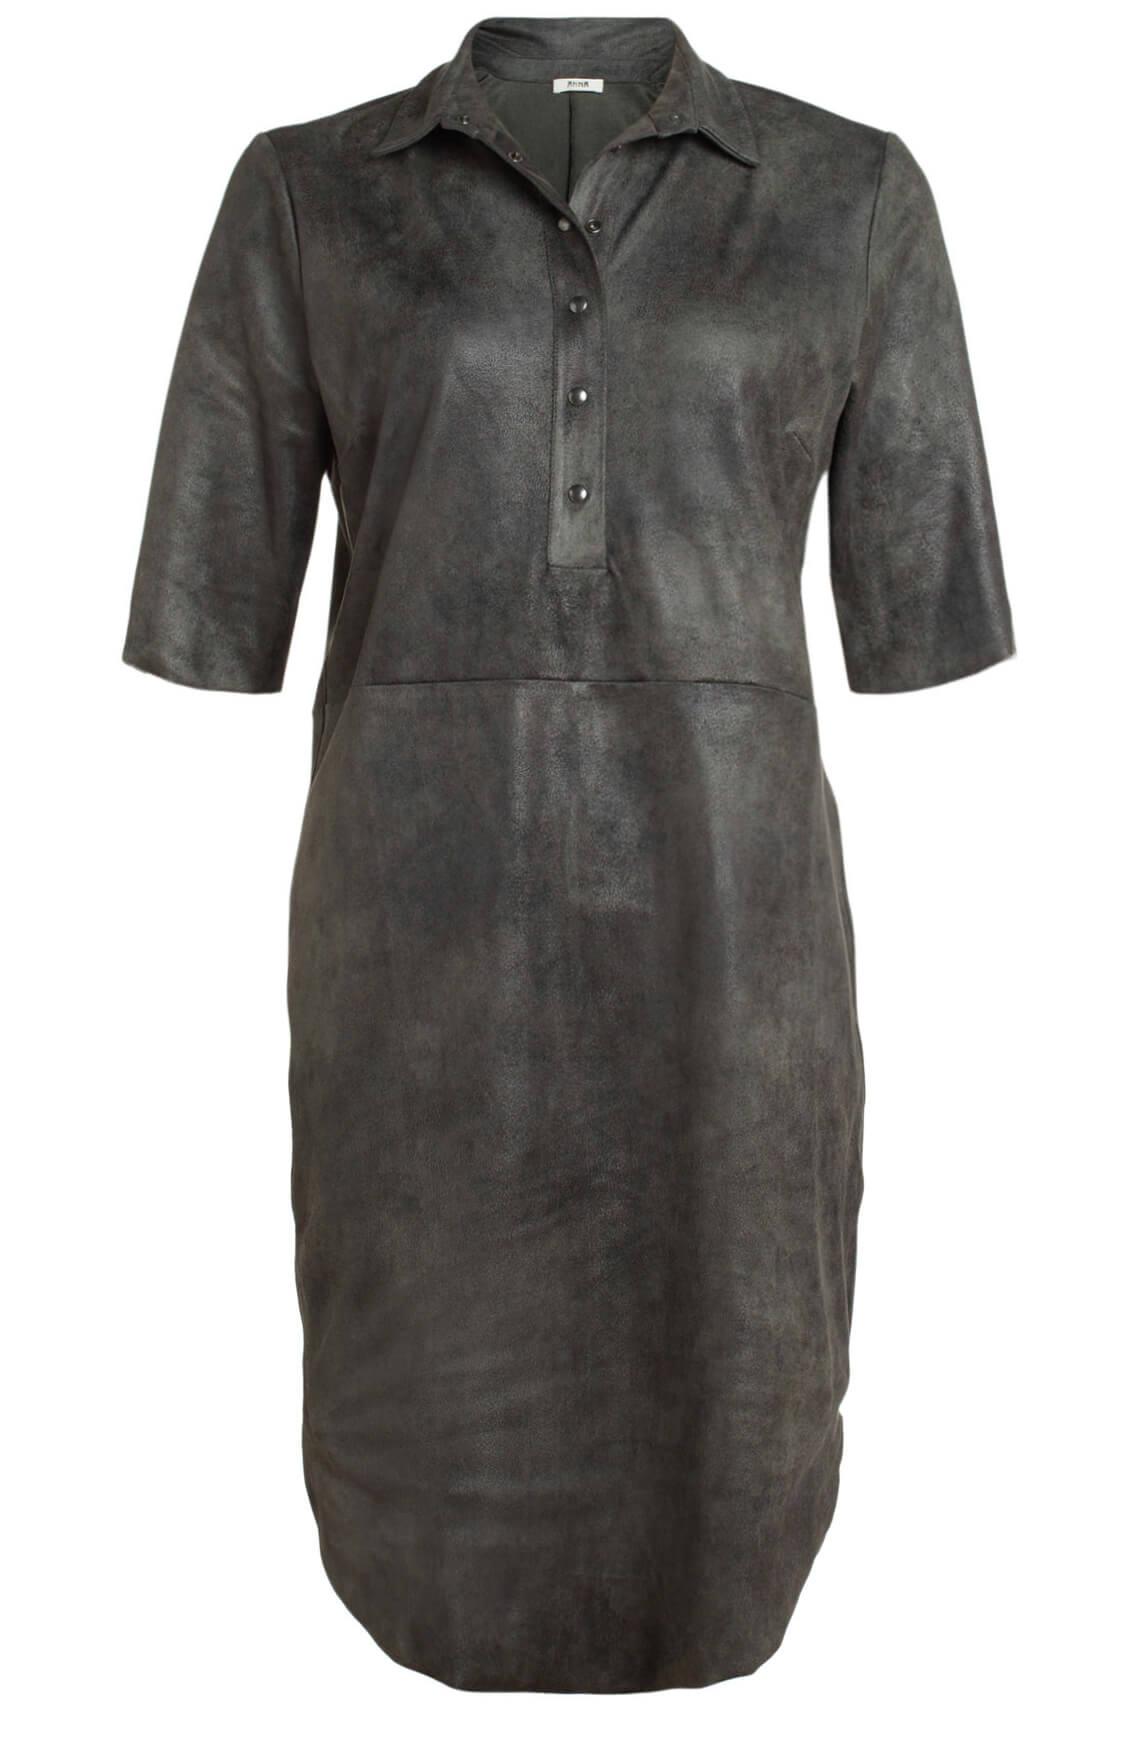 Anna Dames Fake leather jurk groen